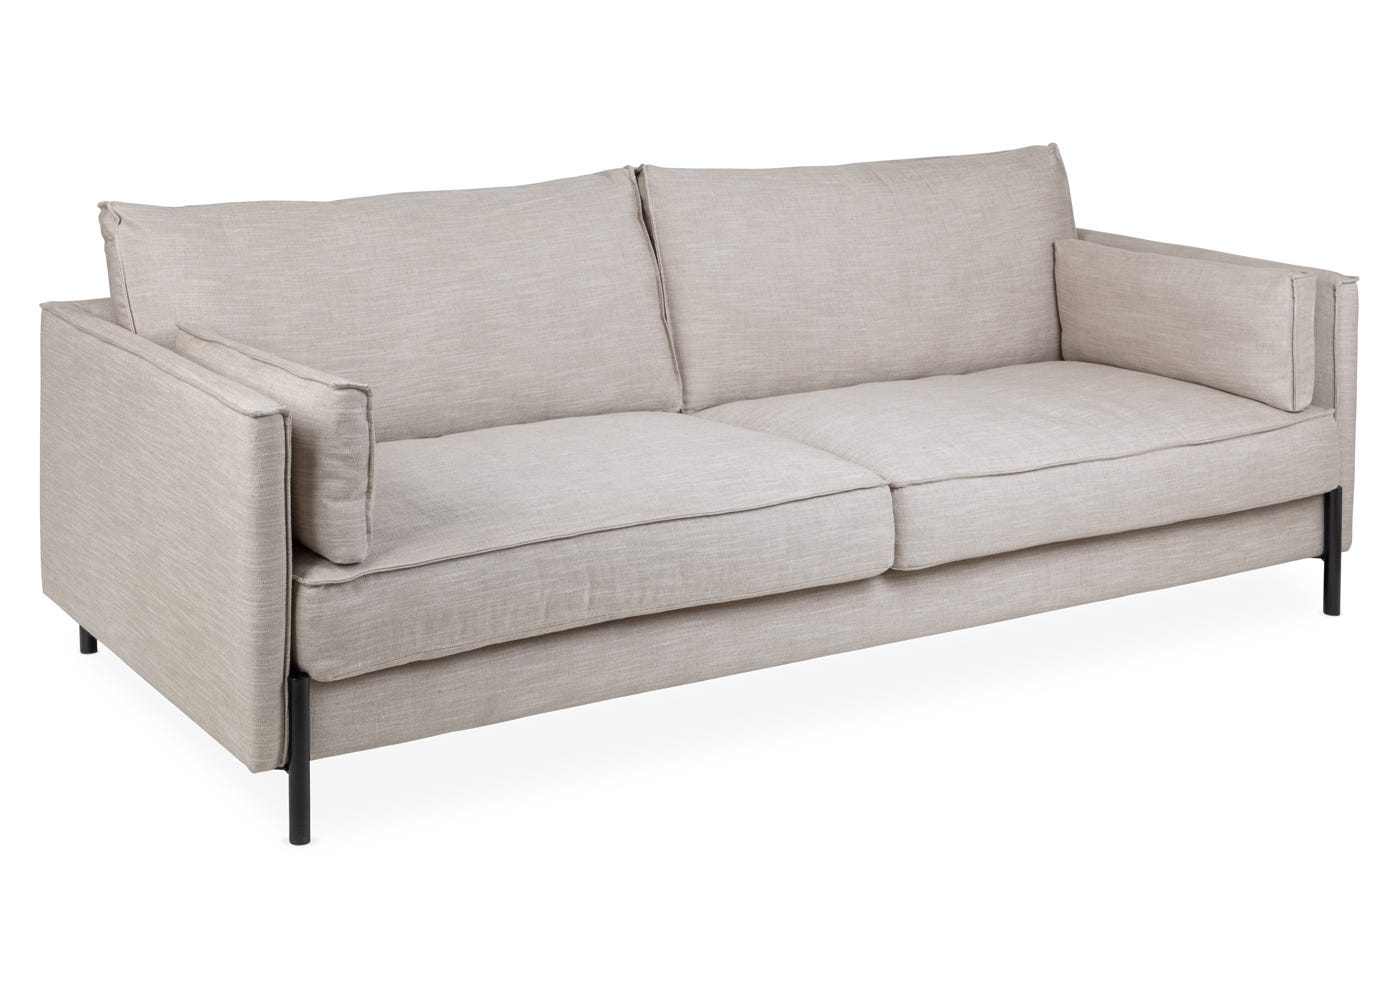 Tortona 4 Seater Sofa in Broad Weave Putty - Angle